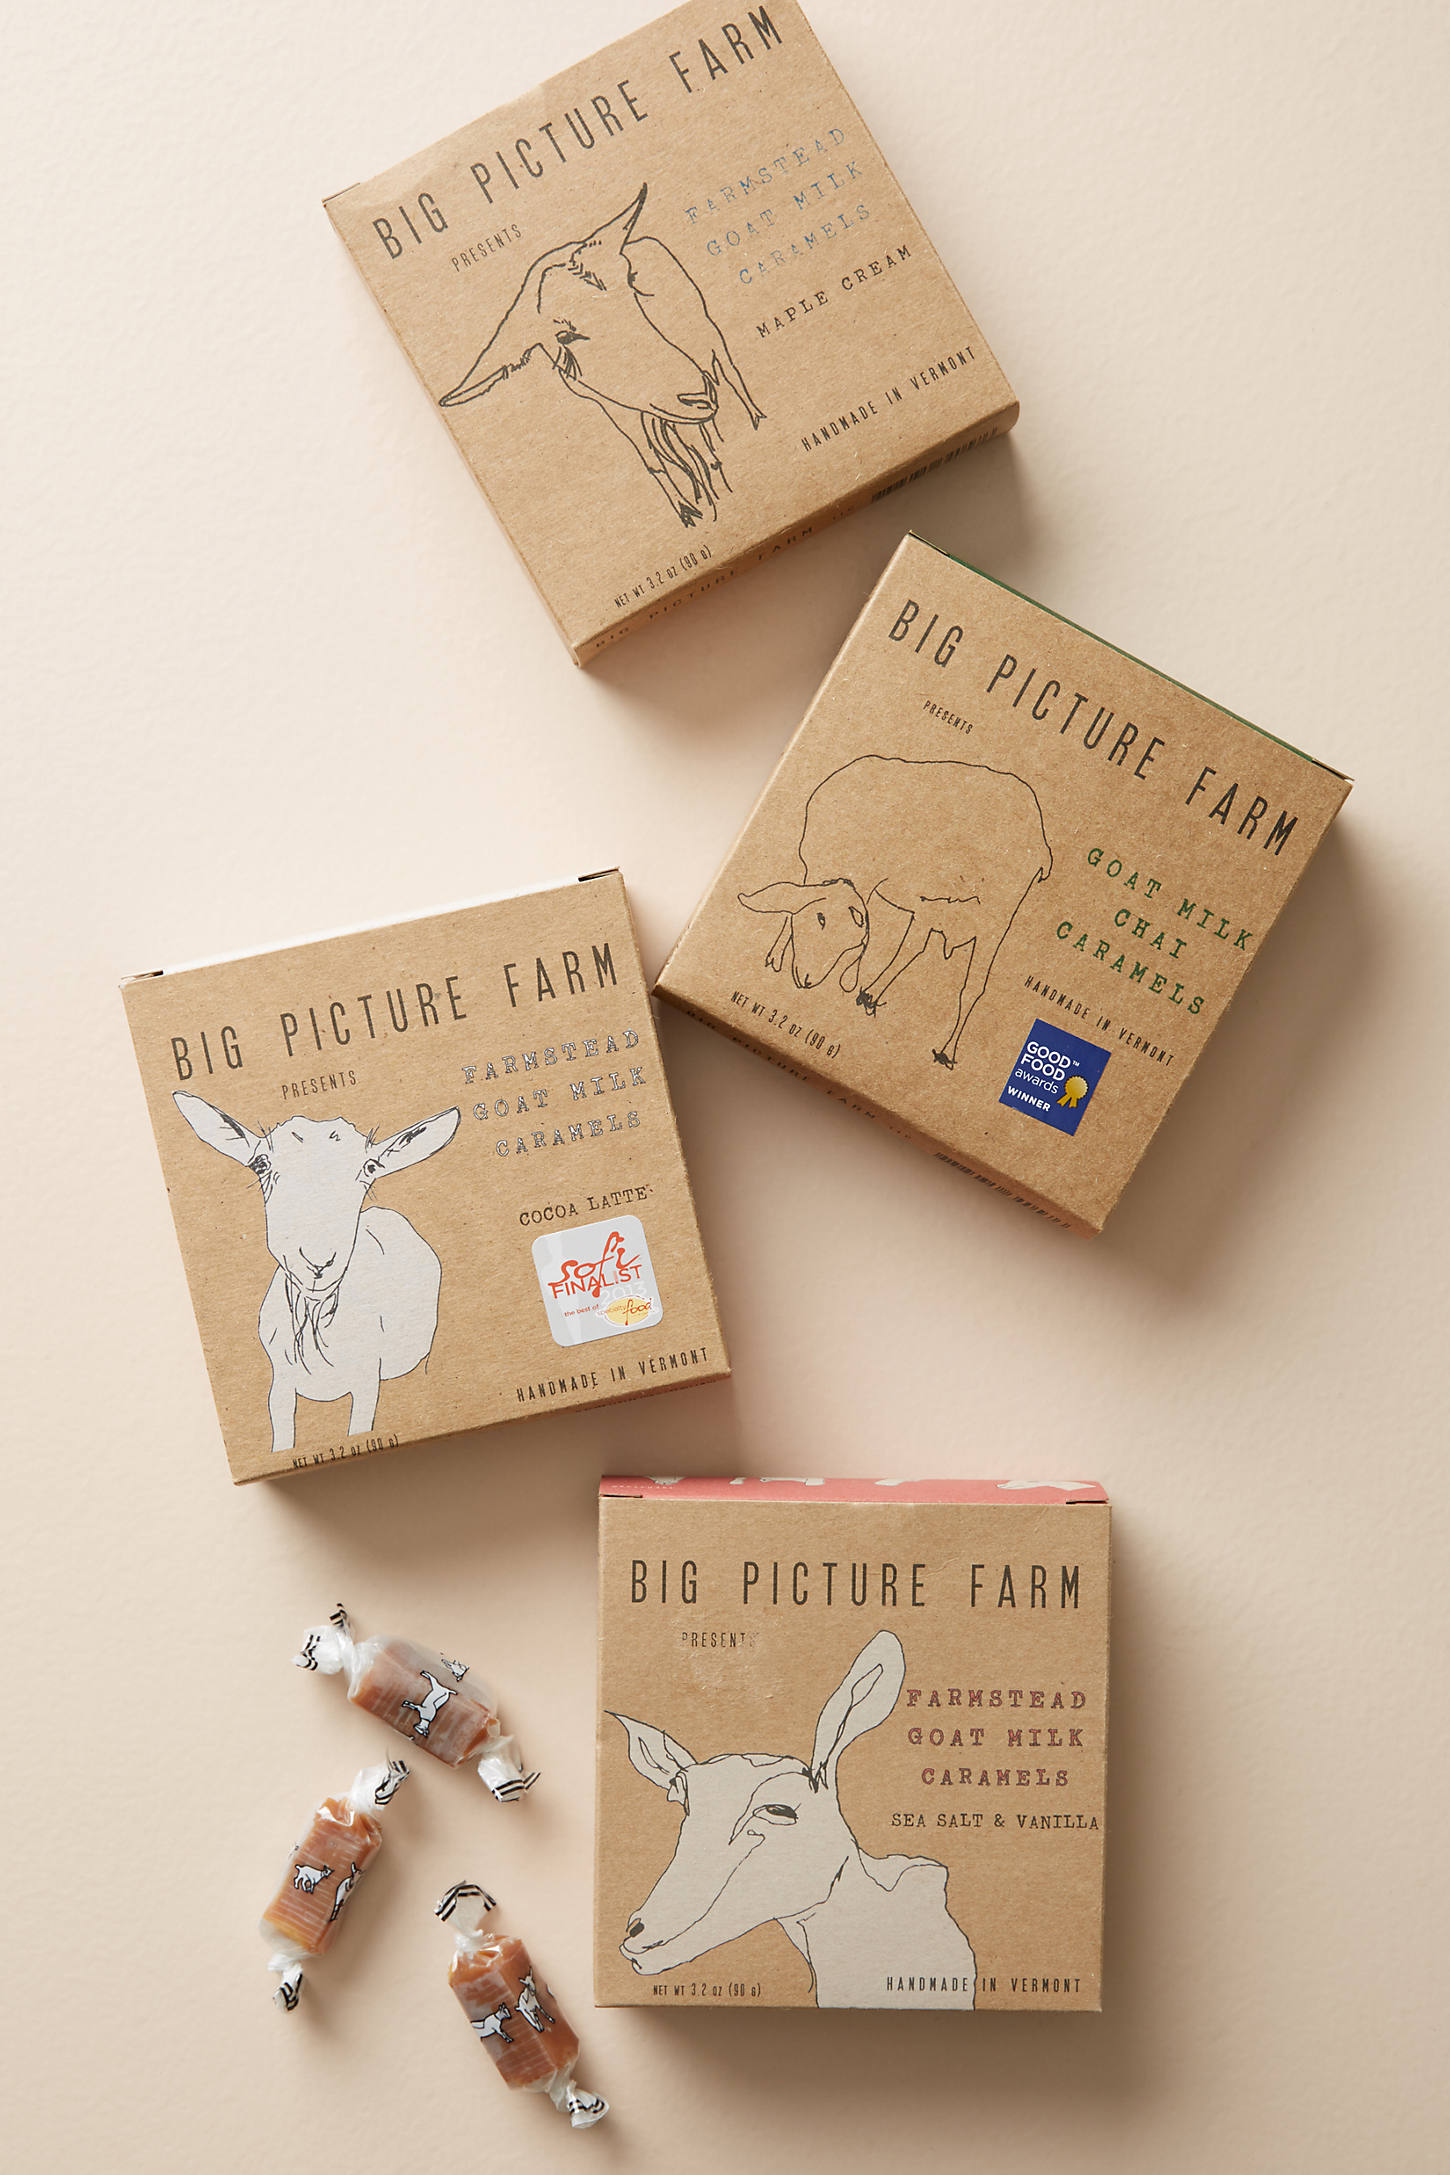 Big Picture Farm Goat Milk Caramel Box Gift Set